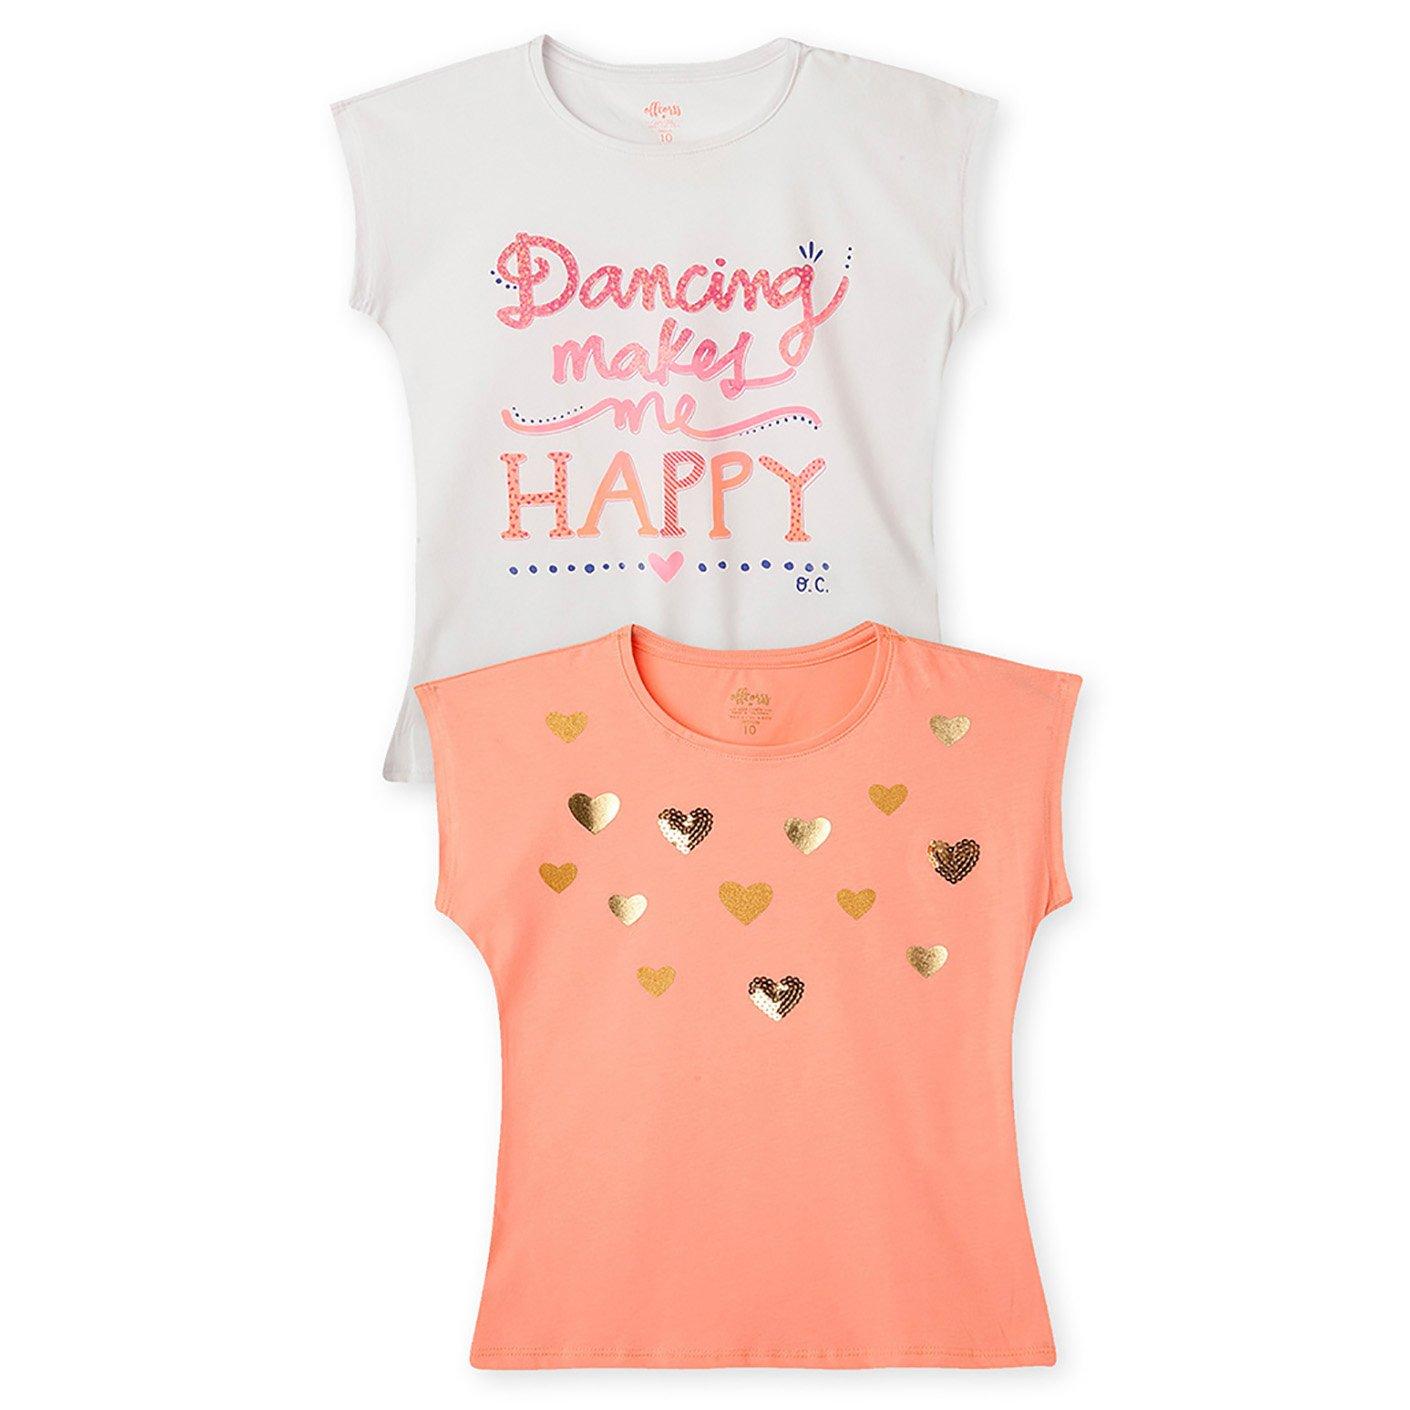 OFFCORSS Trendy Colored Girls T Shirts Blouses Camiseta Franela de Ni/ñas